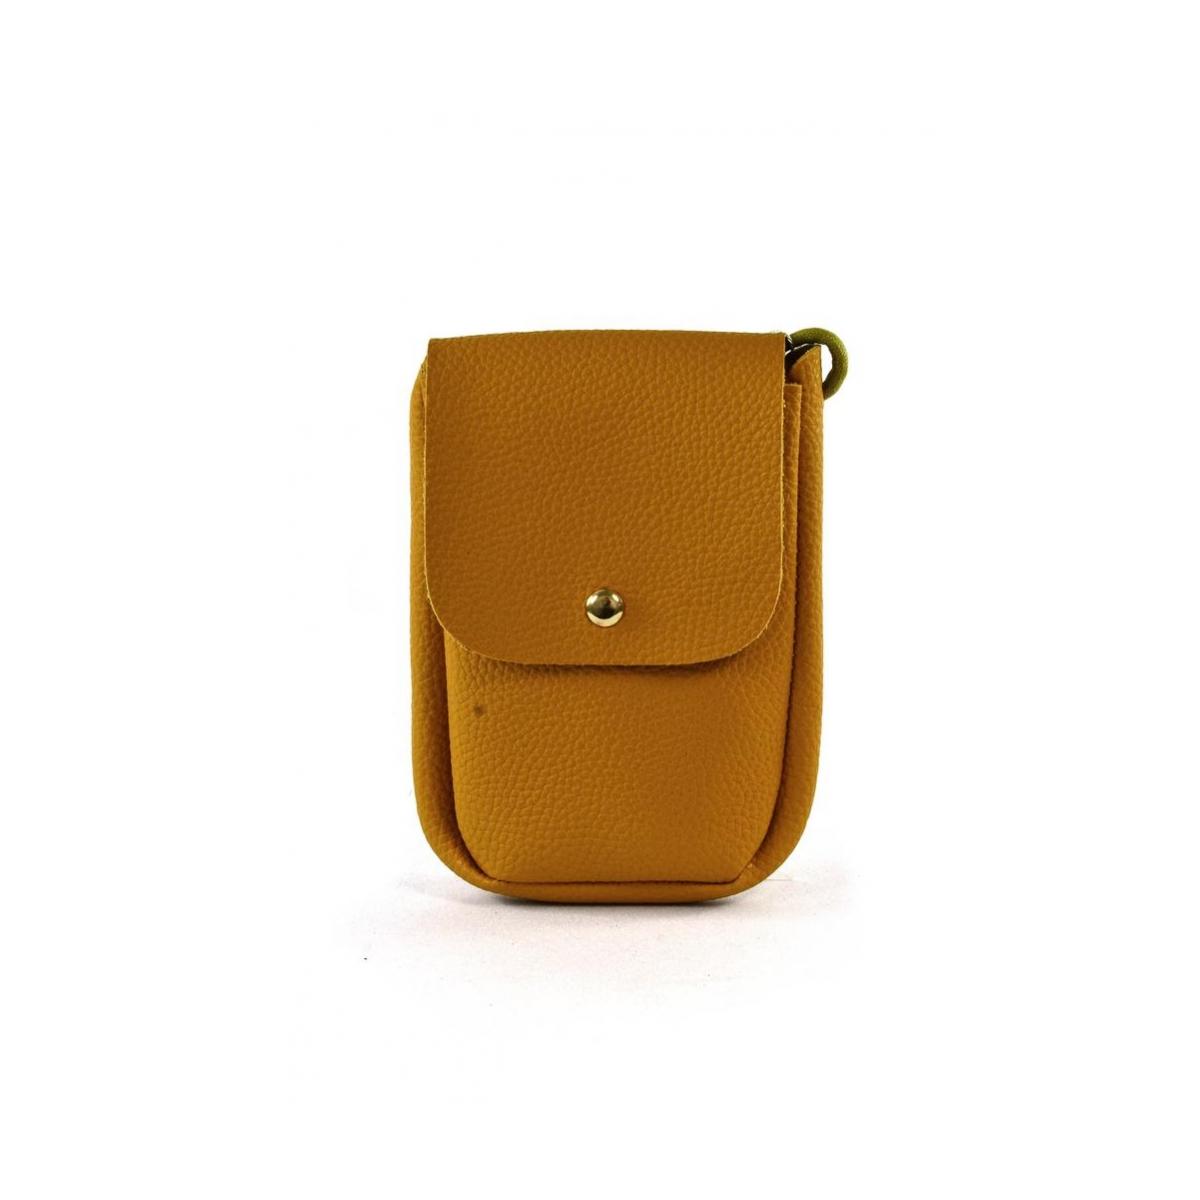 Svetlo-hnedá kabelka 21200 - 2 1ffcc5aa9b4